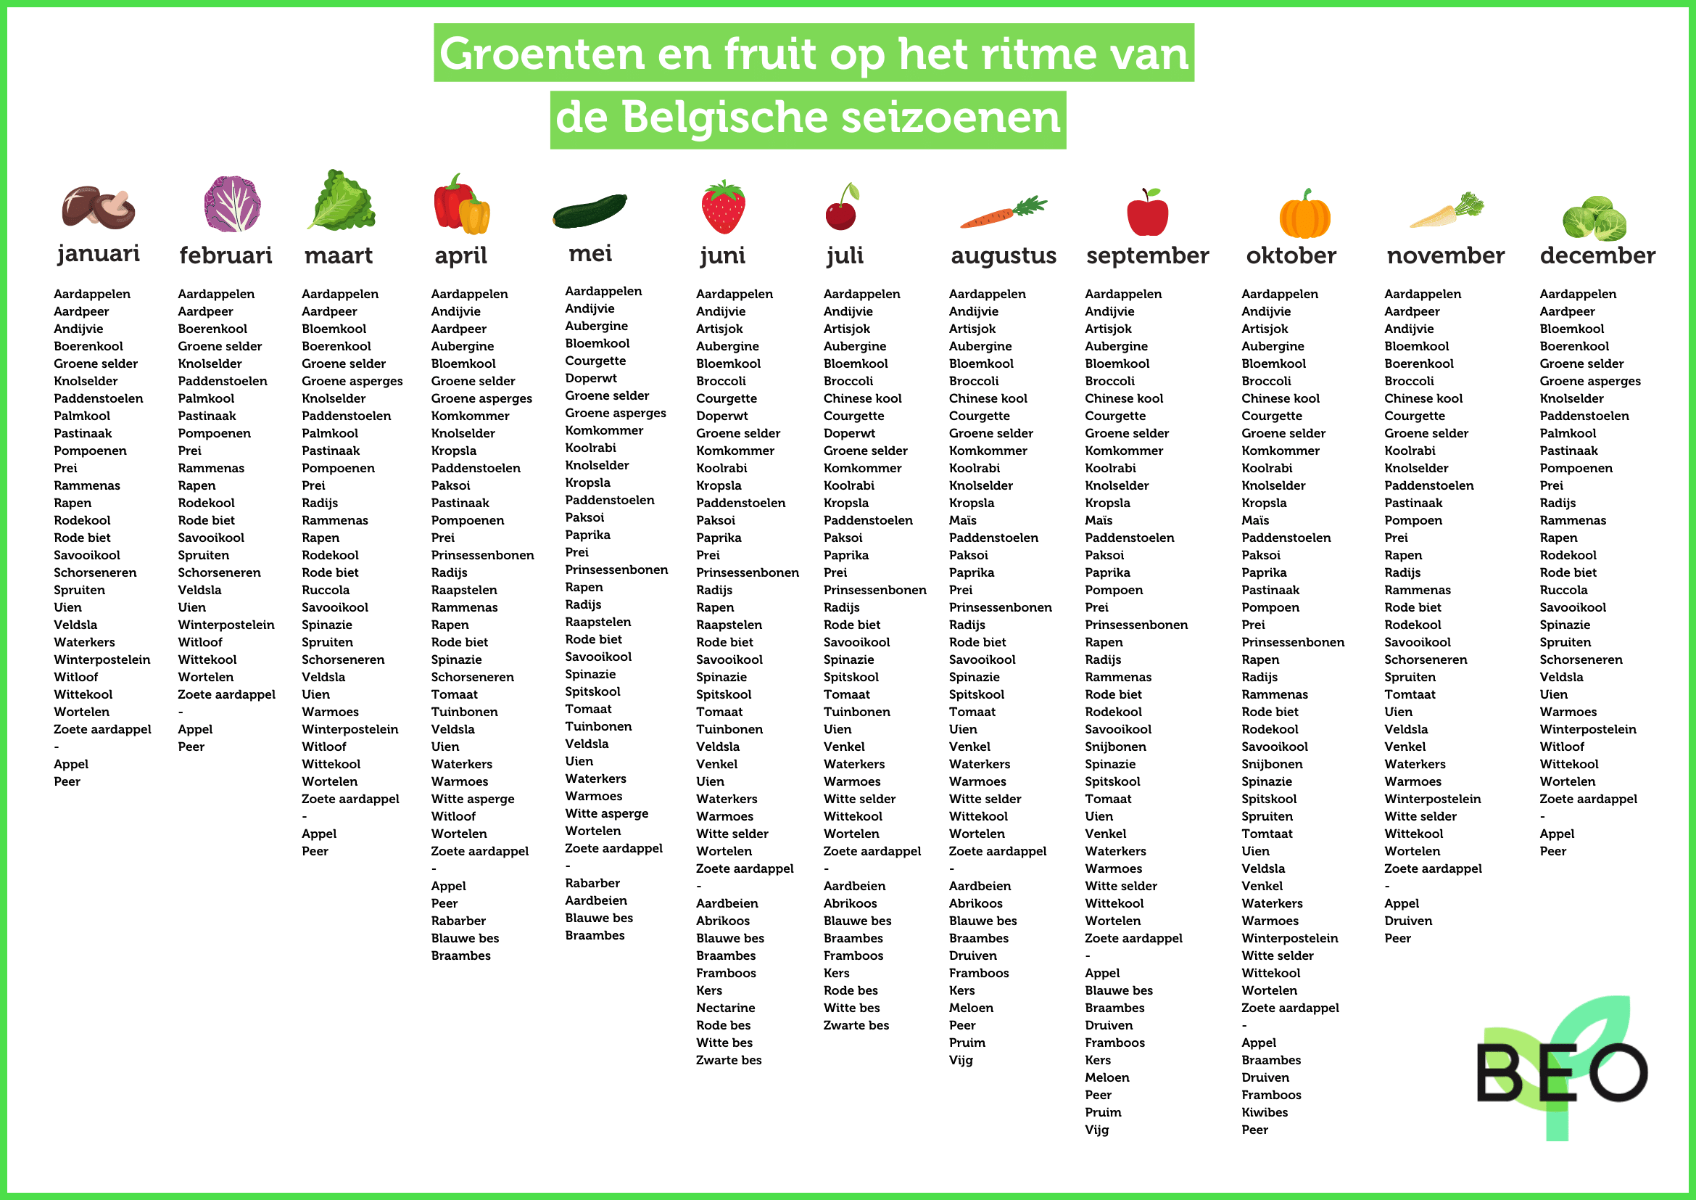 groentekalender-fruitkalender-seizoenskalender-groenten-fruit-beo-markt-afbeelding